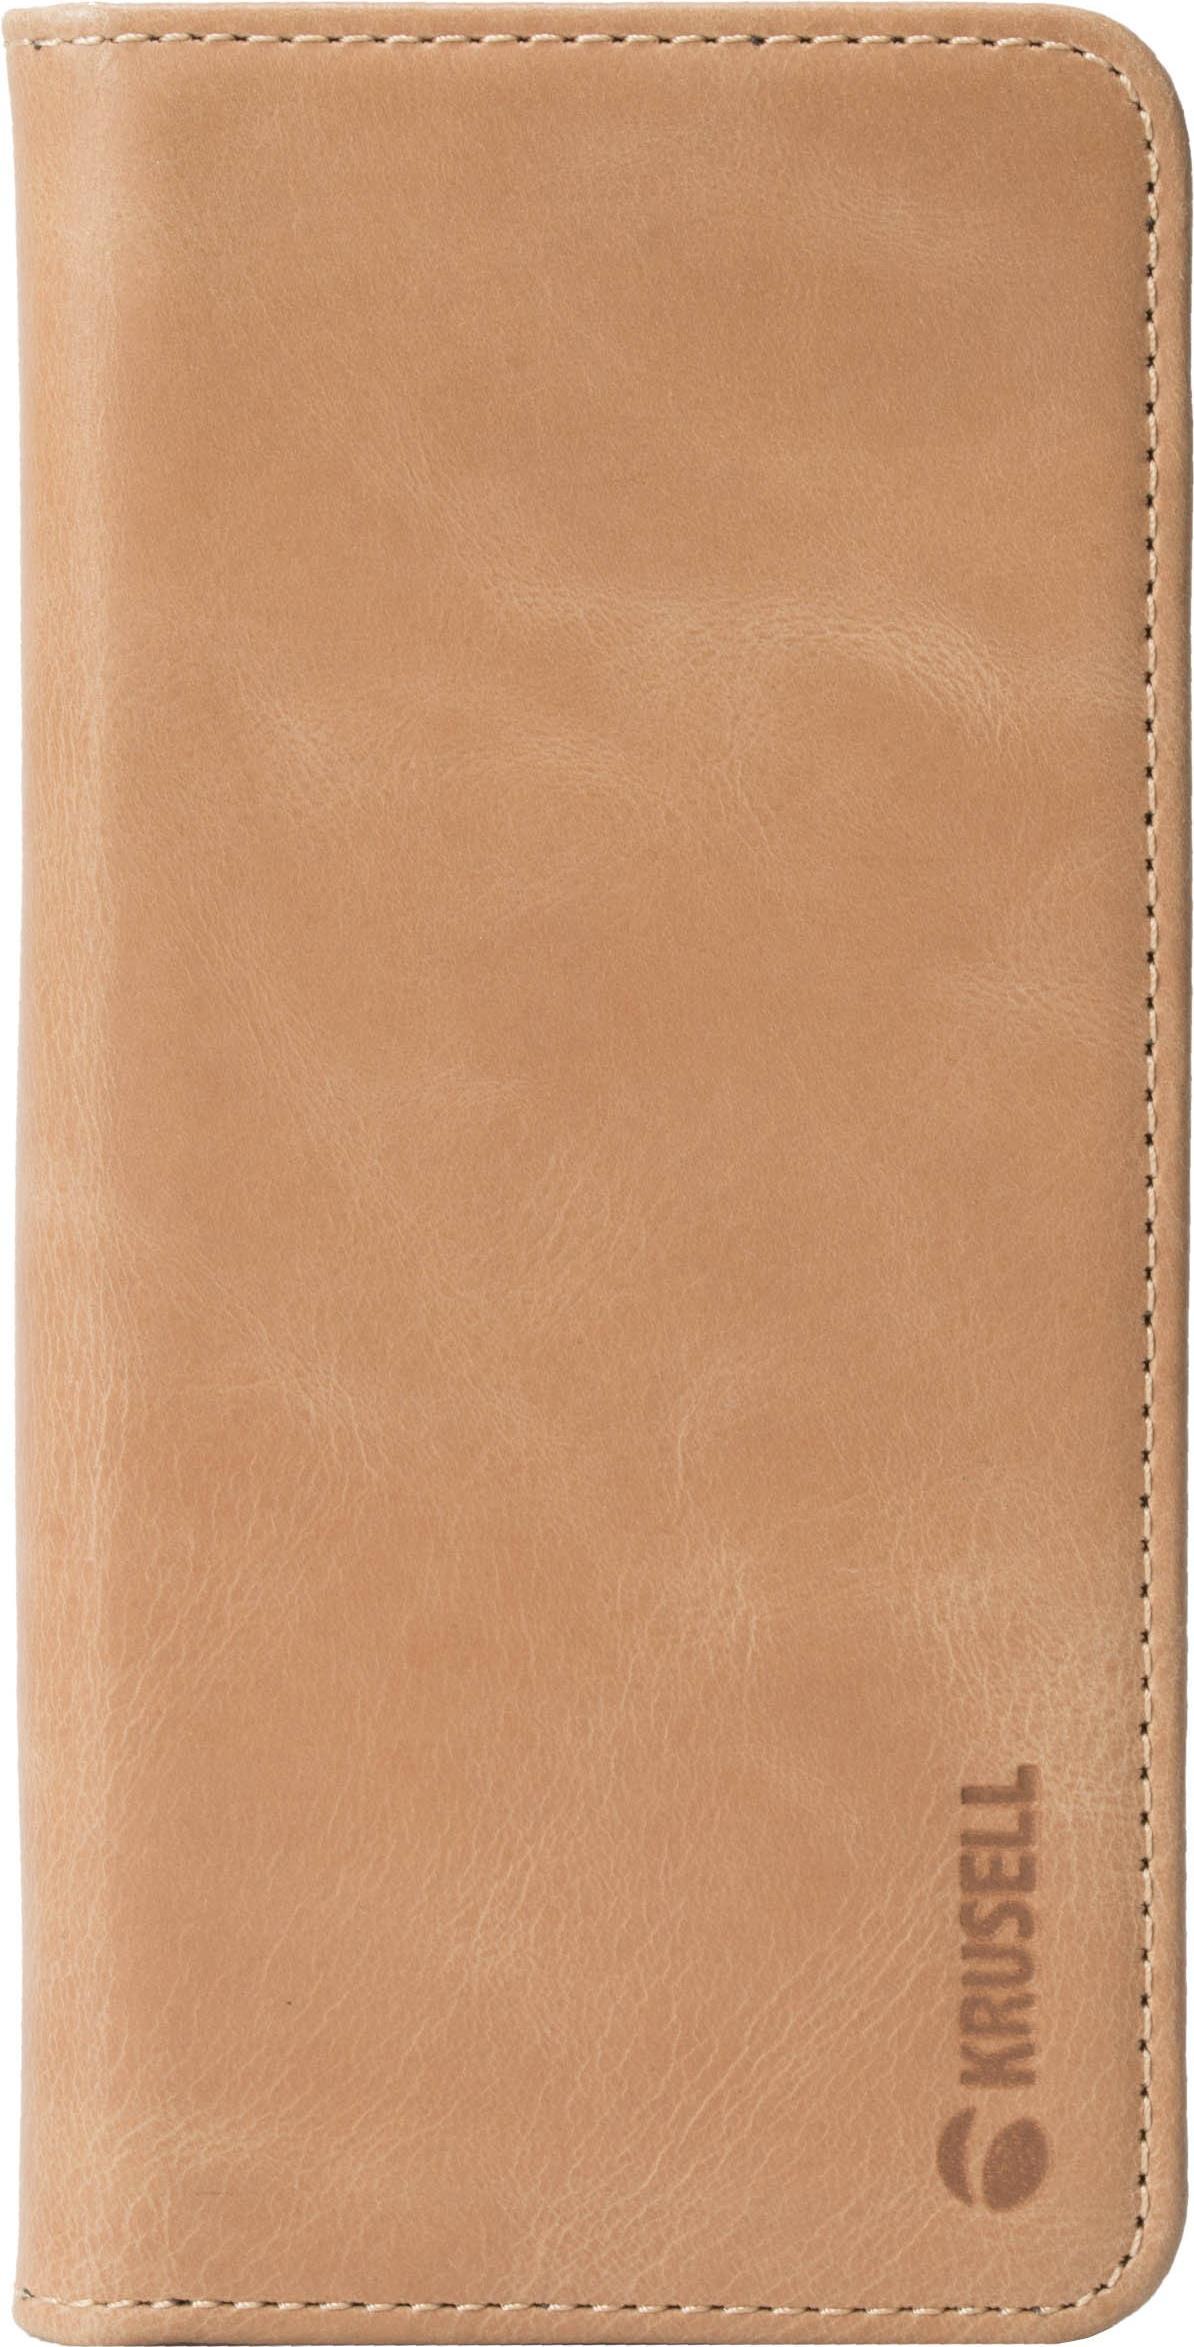 Taschen, Hüllen - Krusell Sunne 4 Card FolioWallet Flip Hülle für Mobiltelefon Gewebe, Vintage Leder Nude für Huawei P20 Pro  - Onlineshop JACOB Elektronik